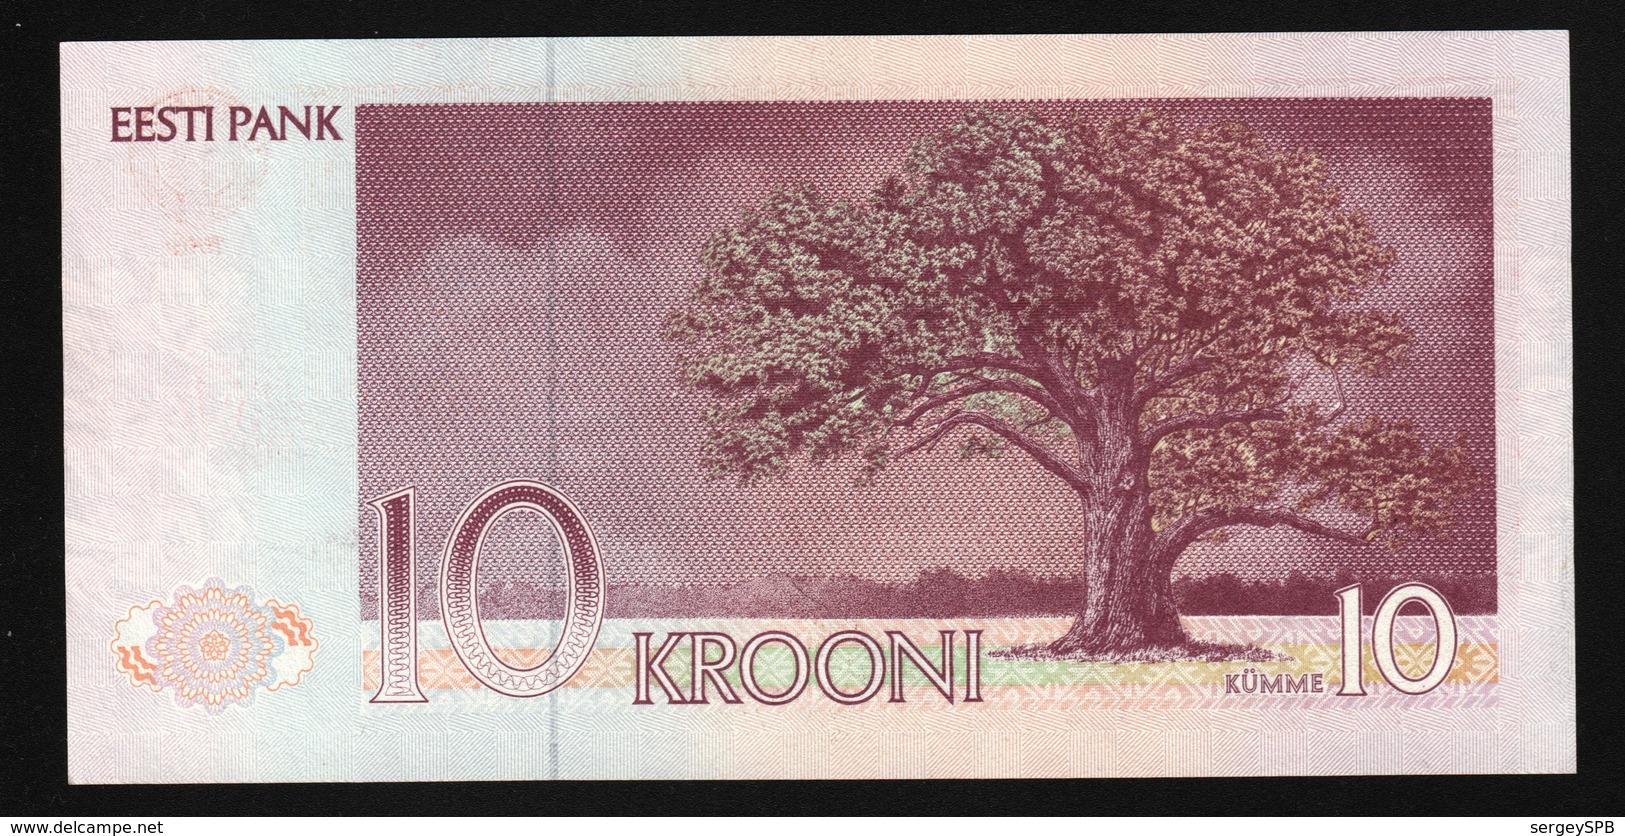 Estonia 10 Krooni 1991 (UNC) P-72a - Estonia